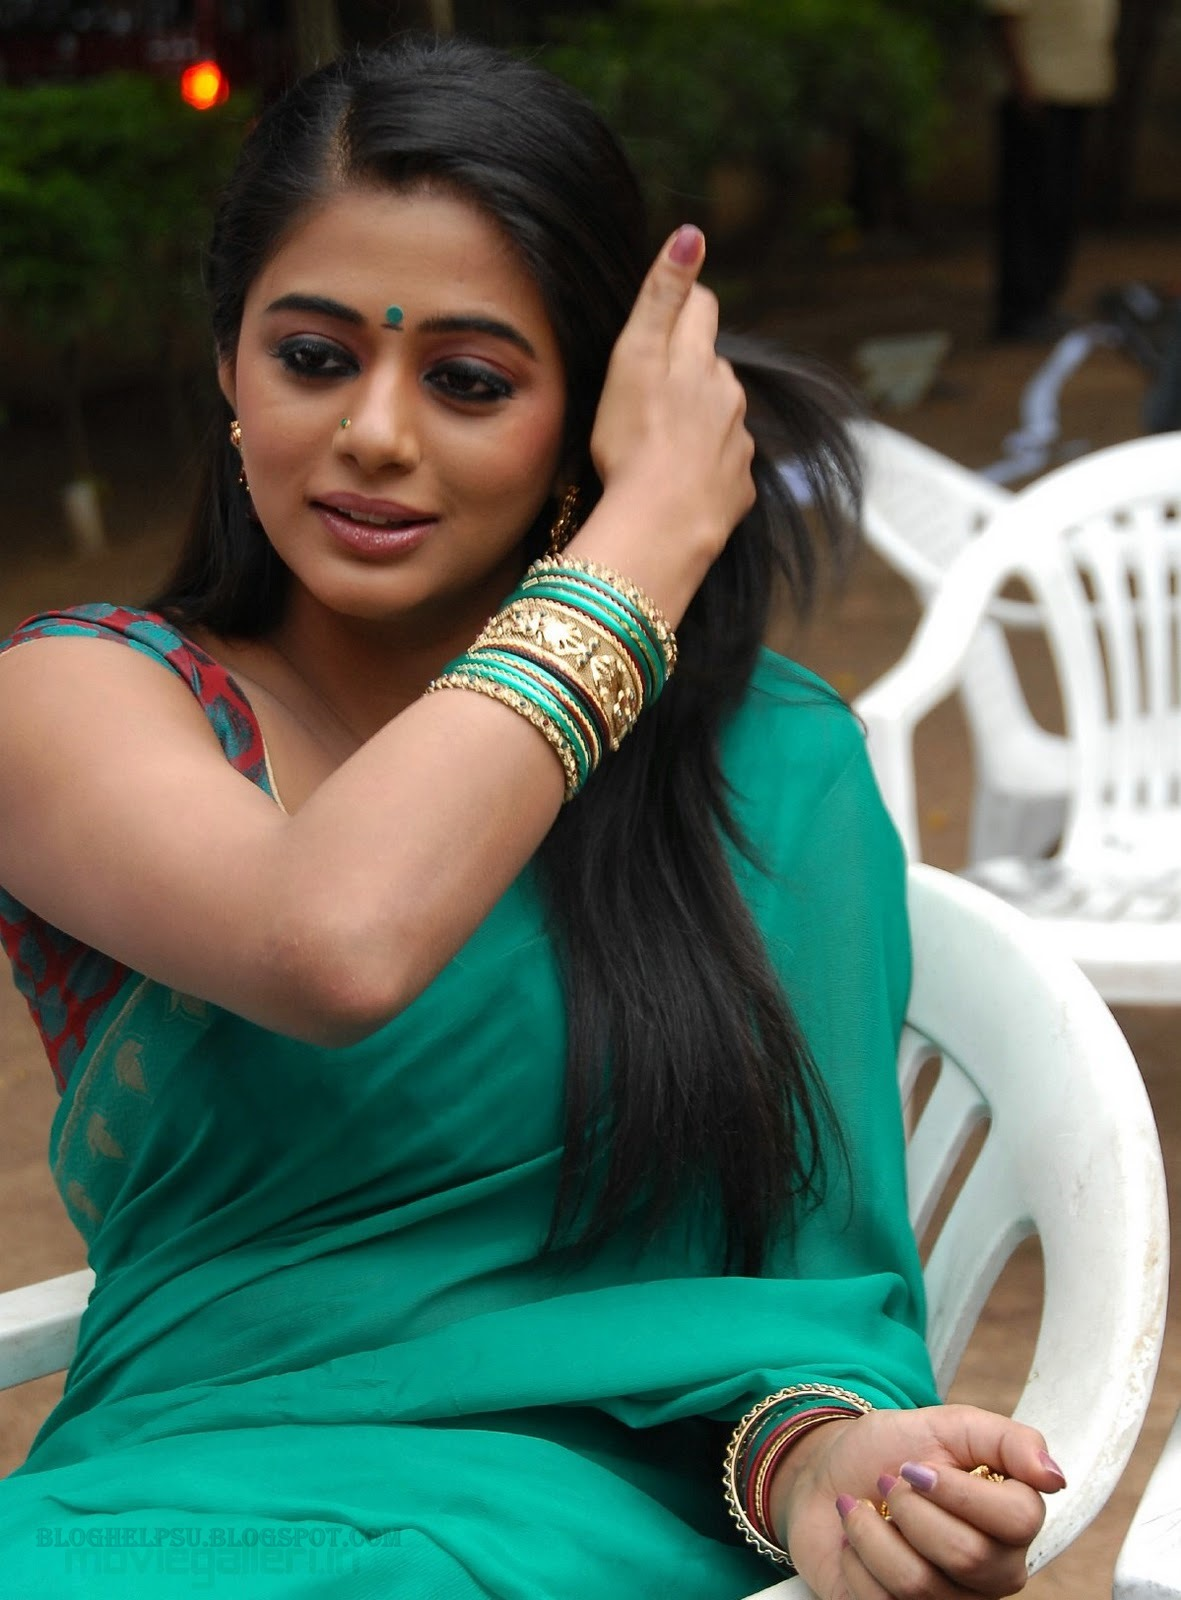 Priyamani latest hot stills priyamani latest hot photos images pics - Priyamani Hot Saree Stills Priyamani Latest Hot Saree Photo Gallery Movieone Gallery